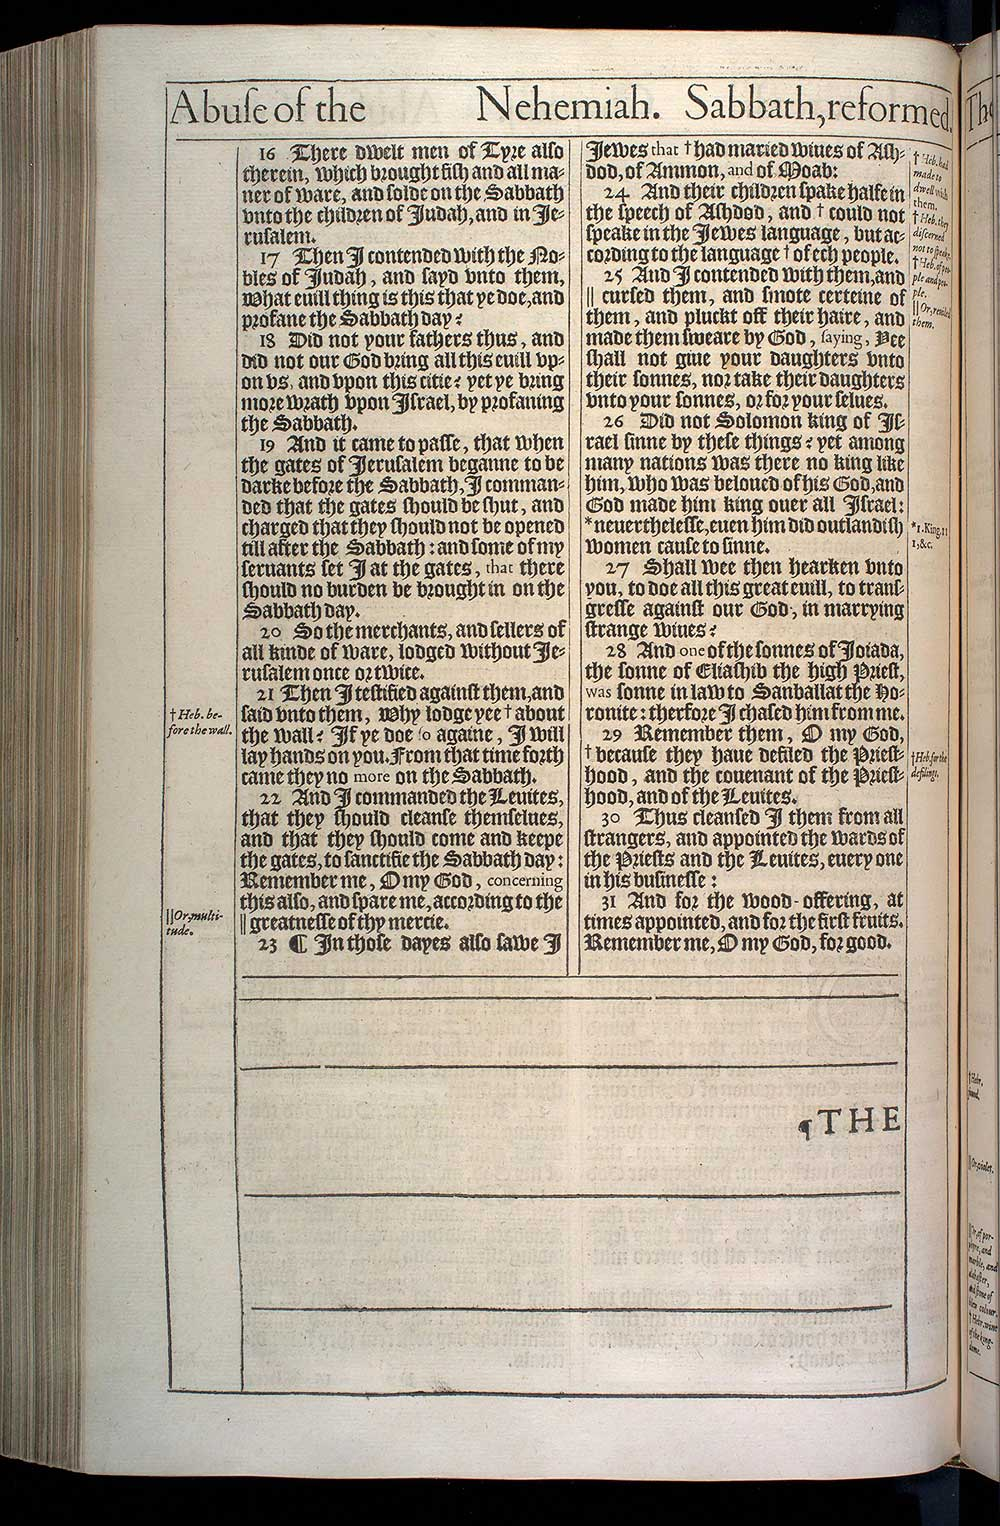 Sabbath Reforms Nehemiah 13 15 22